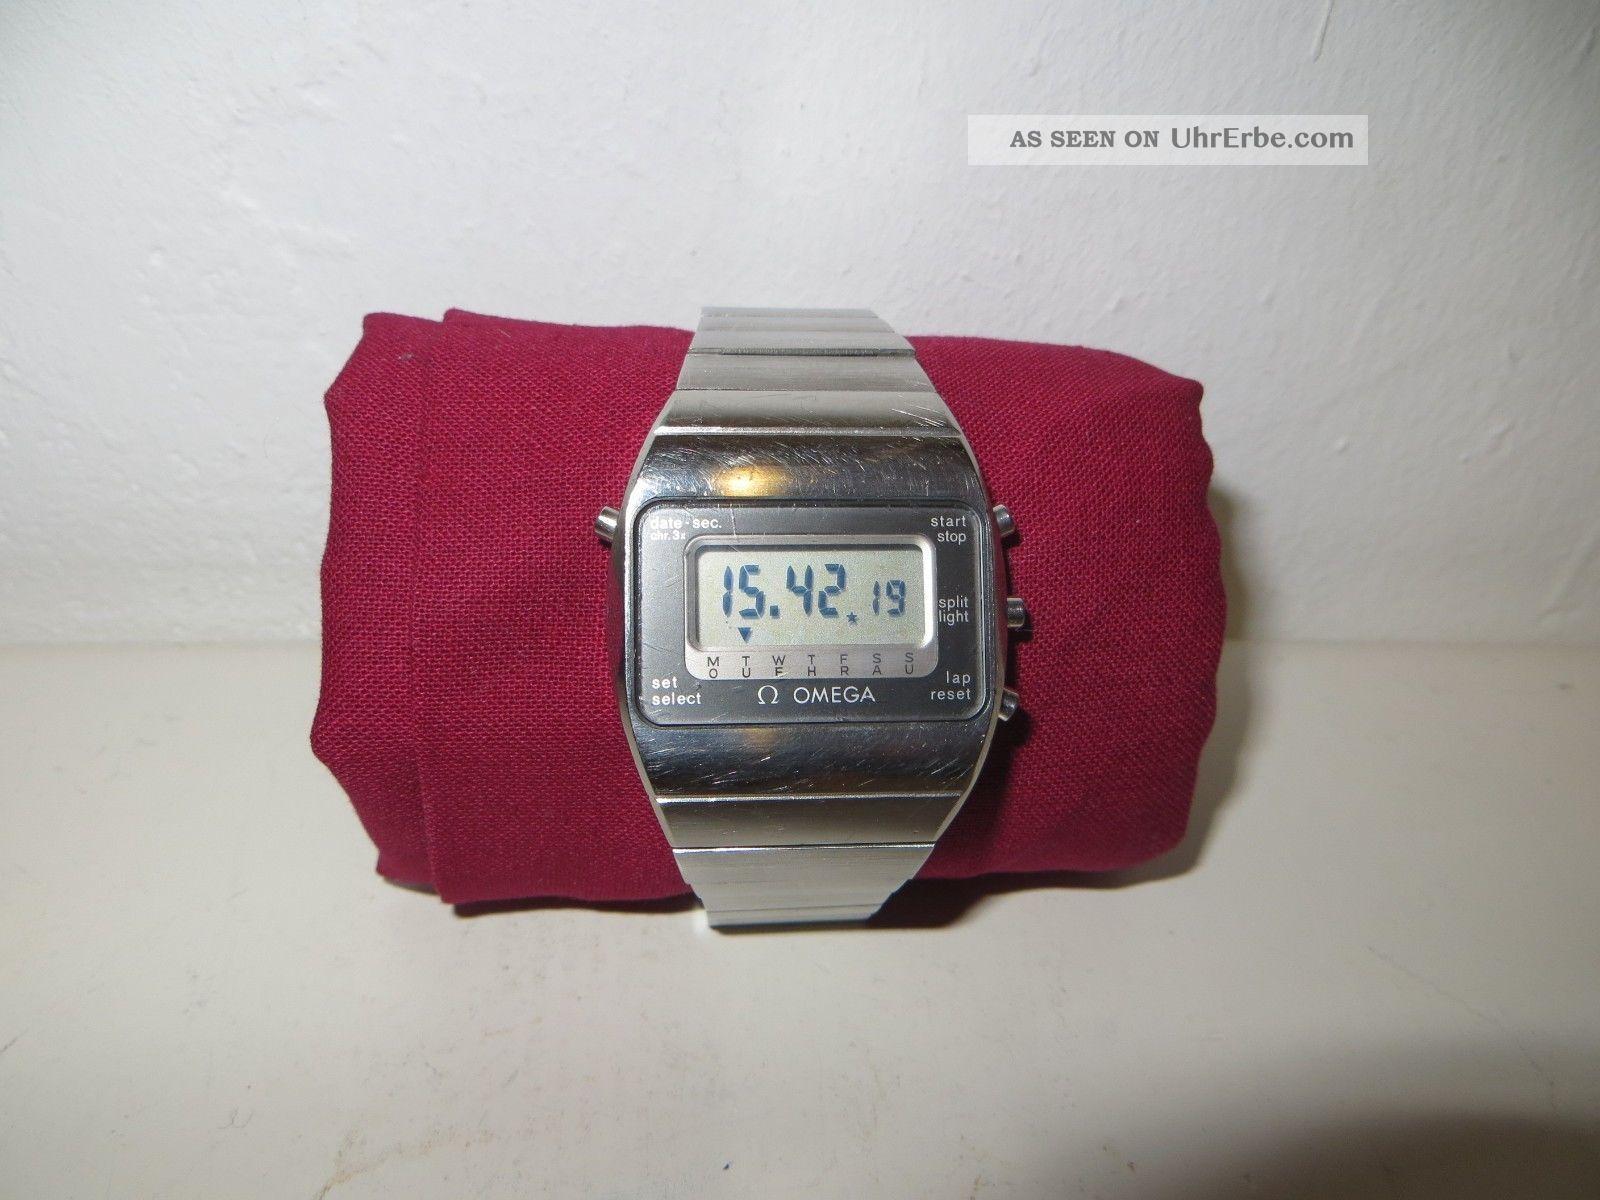 Omega Speedmaster (constellation) - Quarz - Kaliber Lcd 1620 - Vintage - 1981 - Art.  1341 Armbanduhren Bild